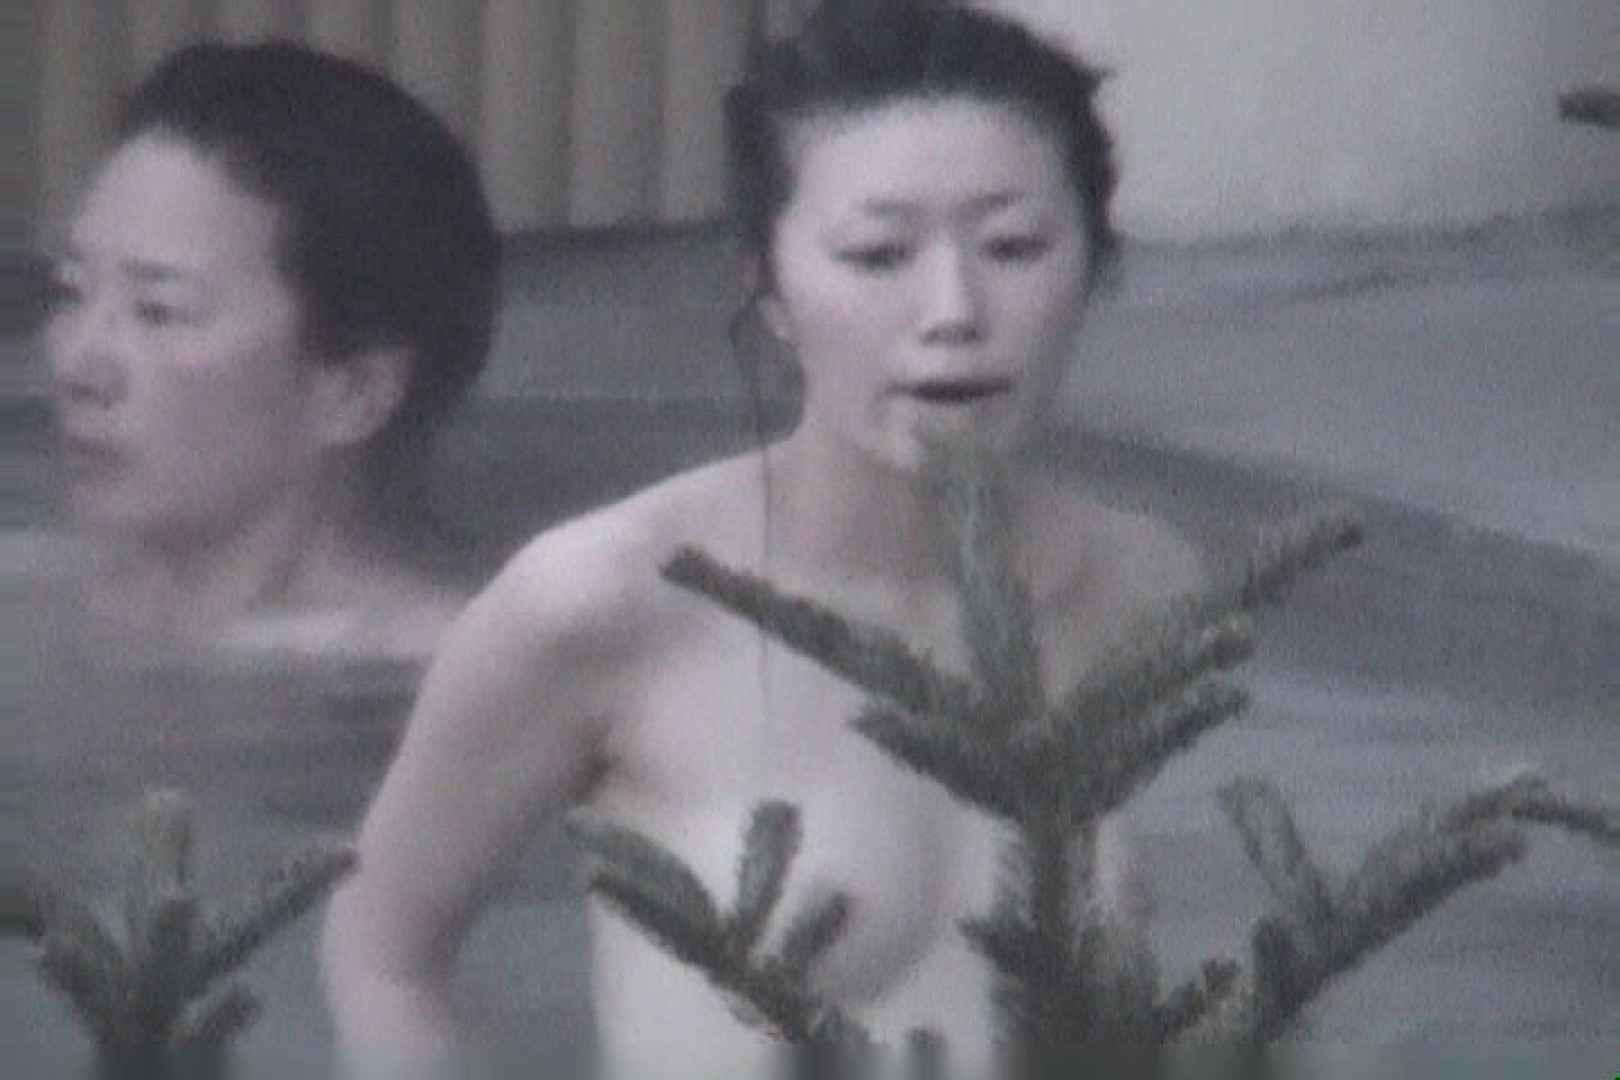 Aquaな露天風呂Vol.84【VIP限定】 OLのプライベート オメコ無修正動画無料 13pic 5